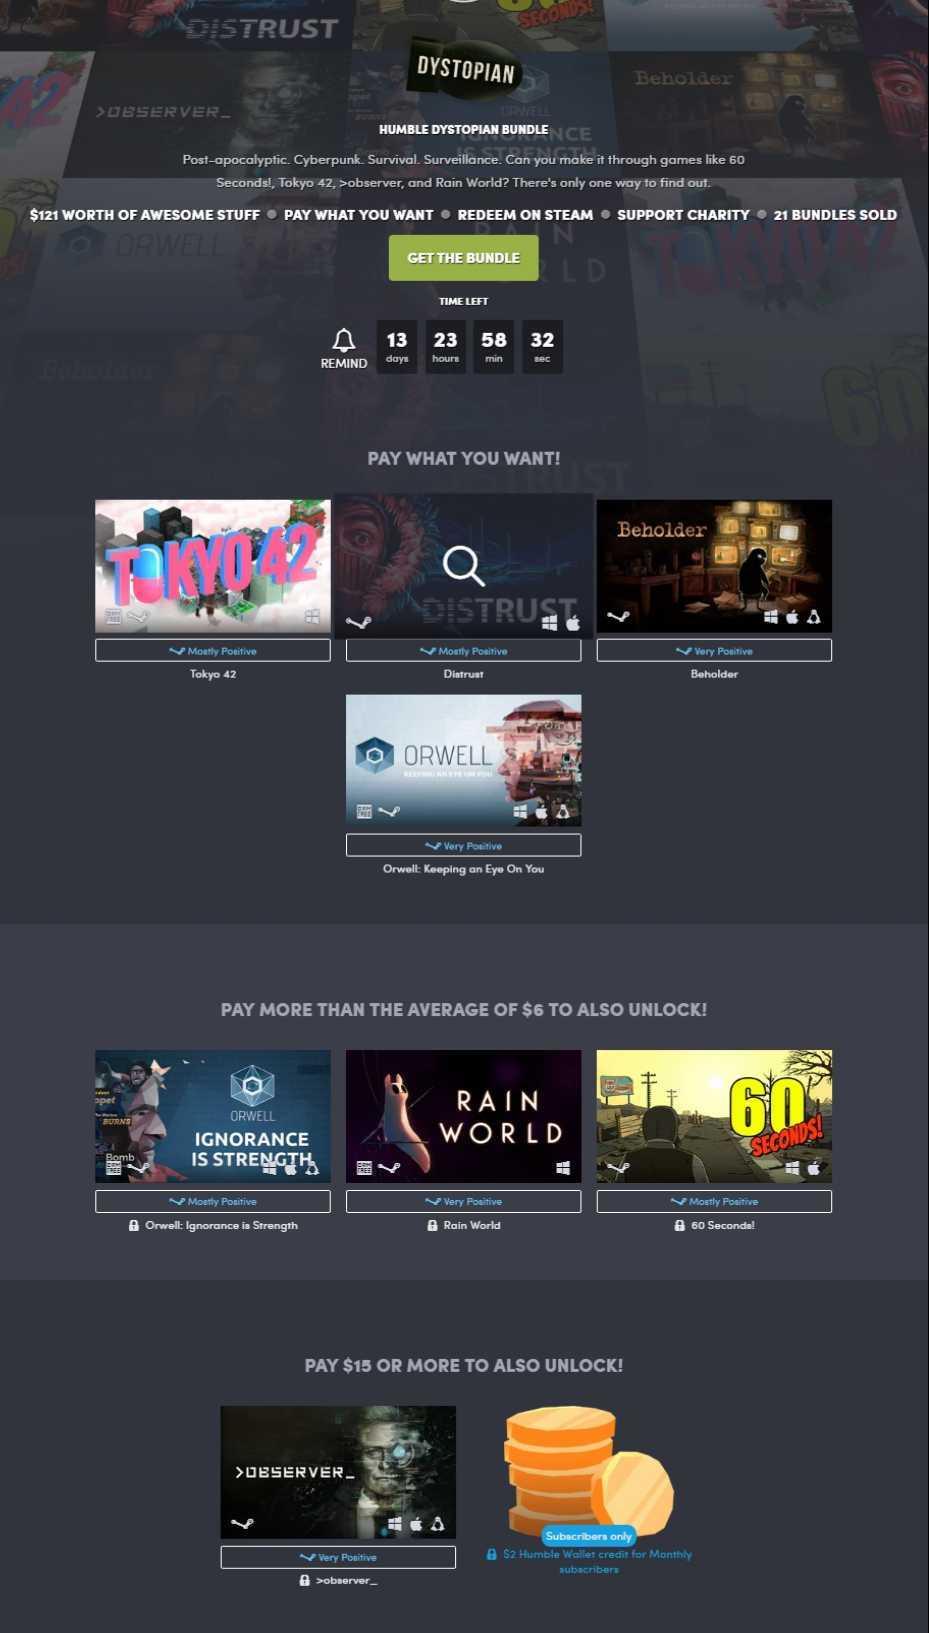 screenshot-www.humblebundle.com-2018.11.14-04-01-28.jpg